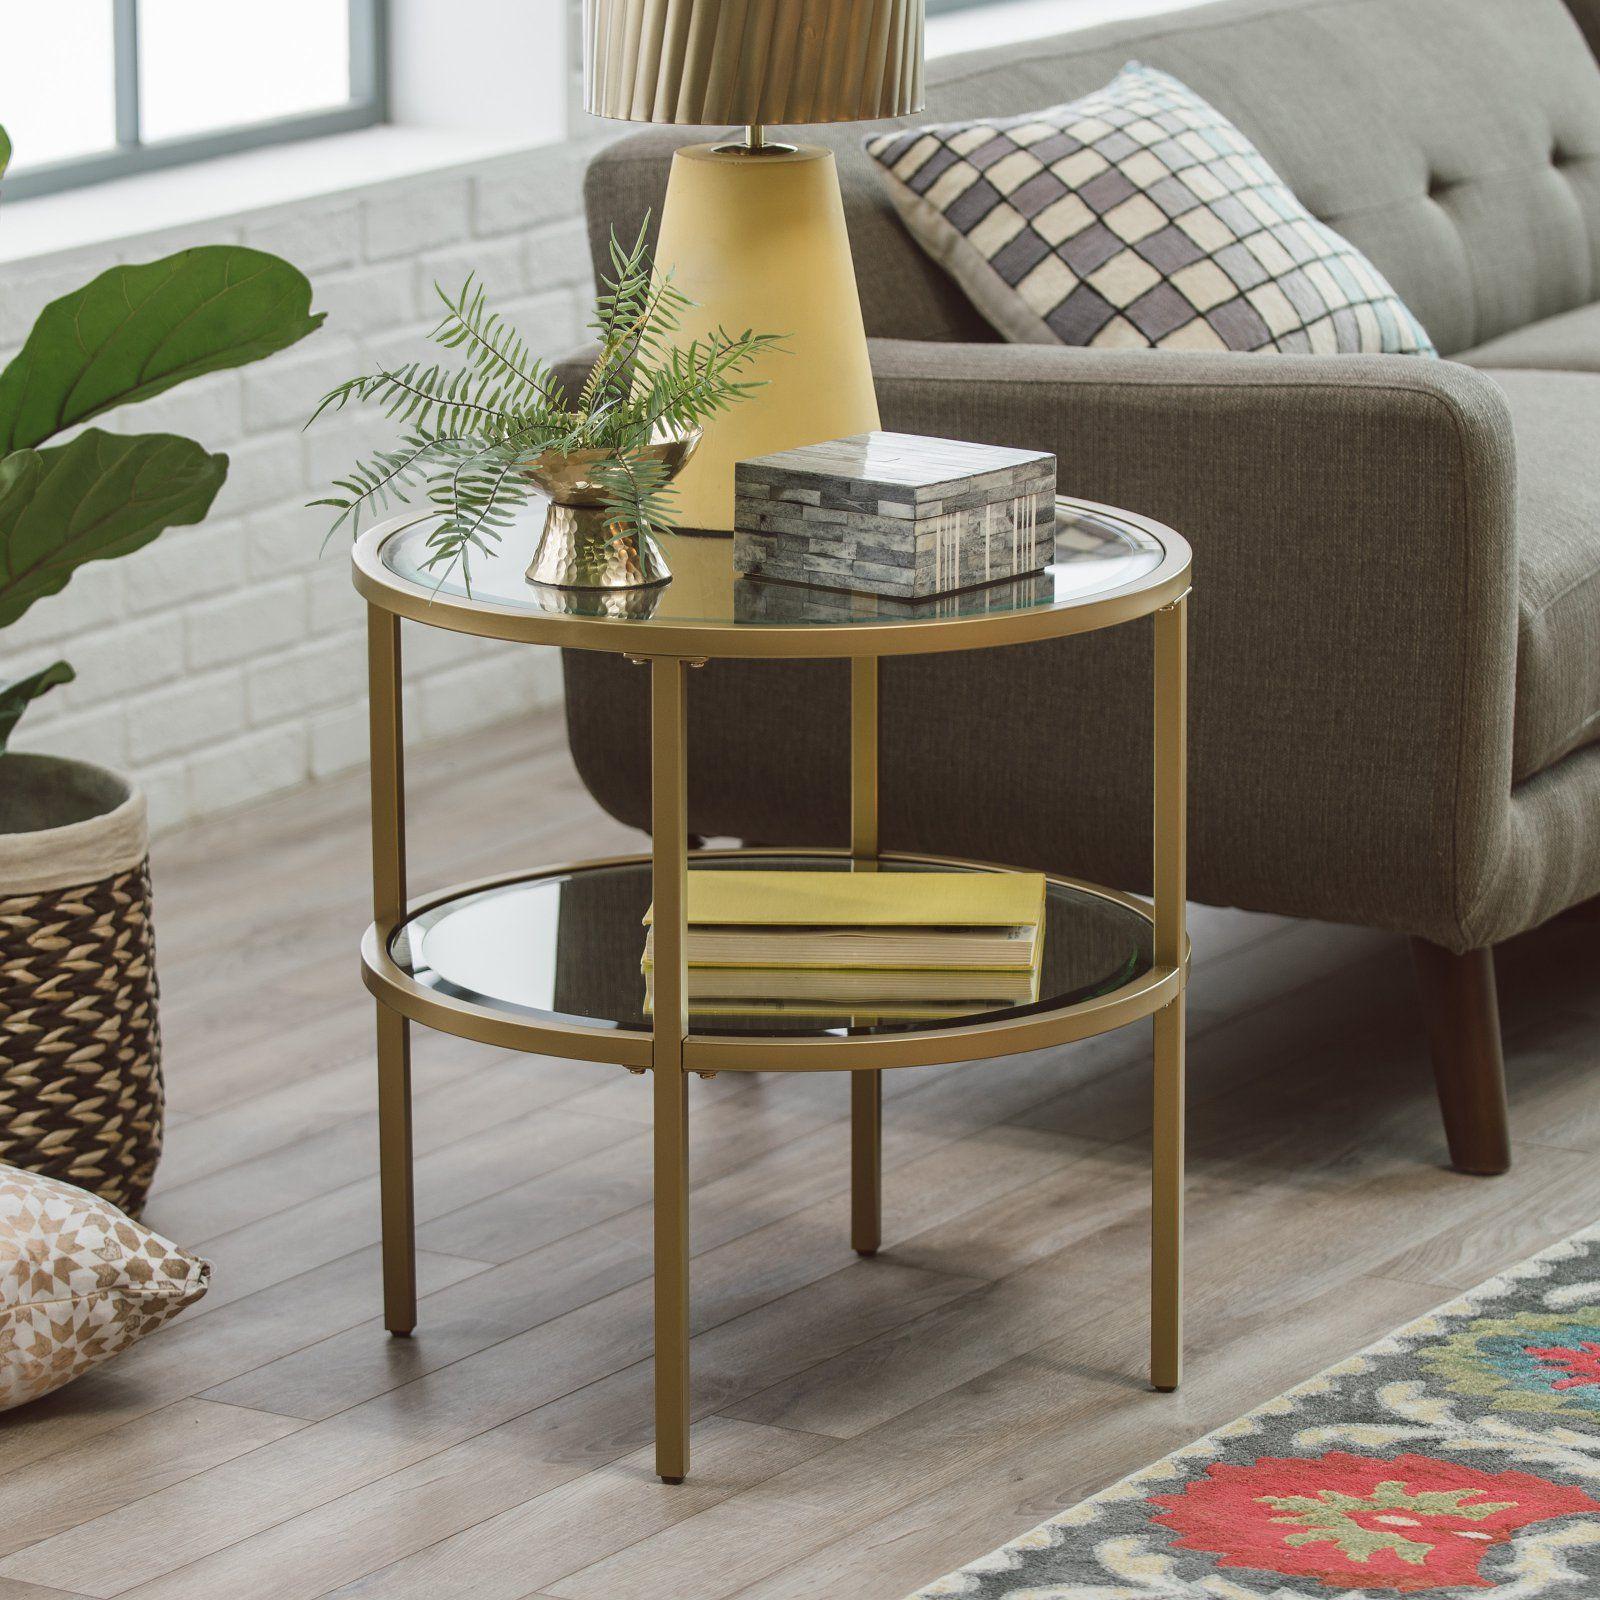 Belham Living Lamont Round End Table - Gold | Table decor ...